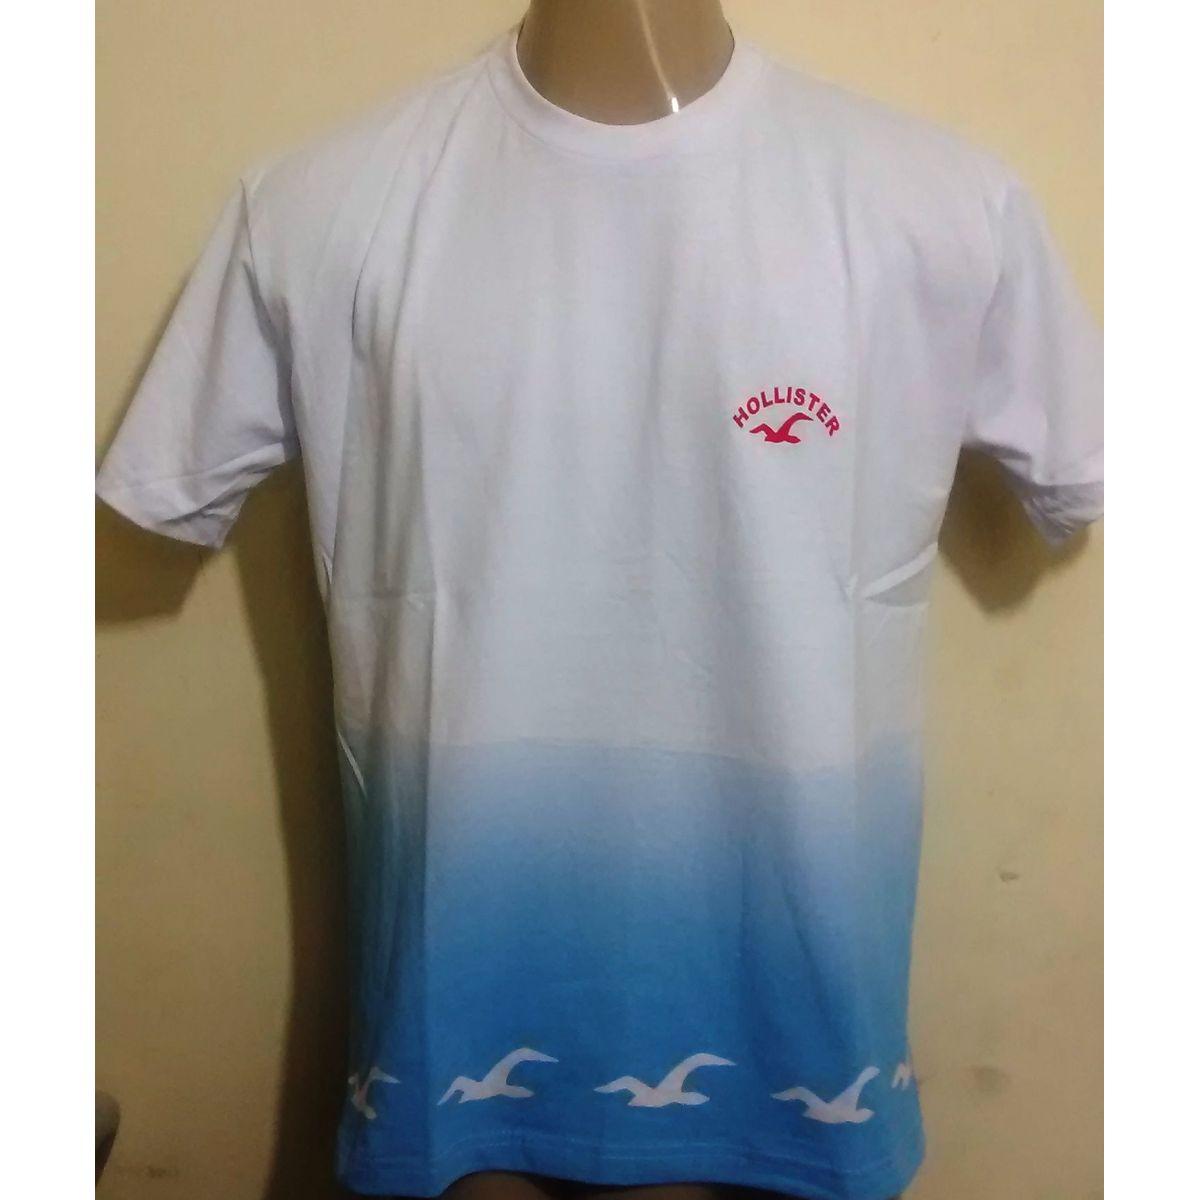 Kit C/ 20 Camisetas Masculinas Degrade Diversas Marcas